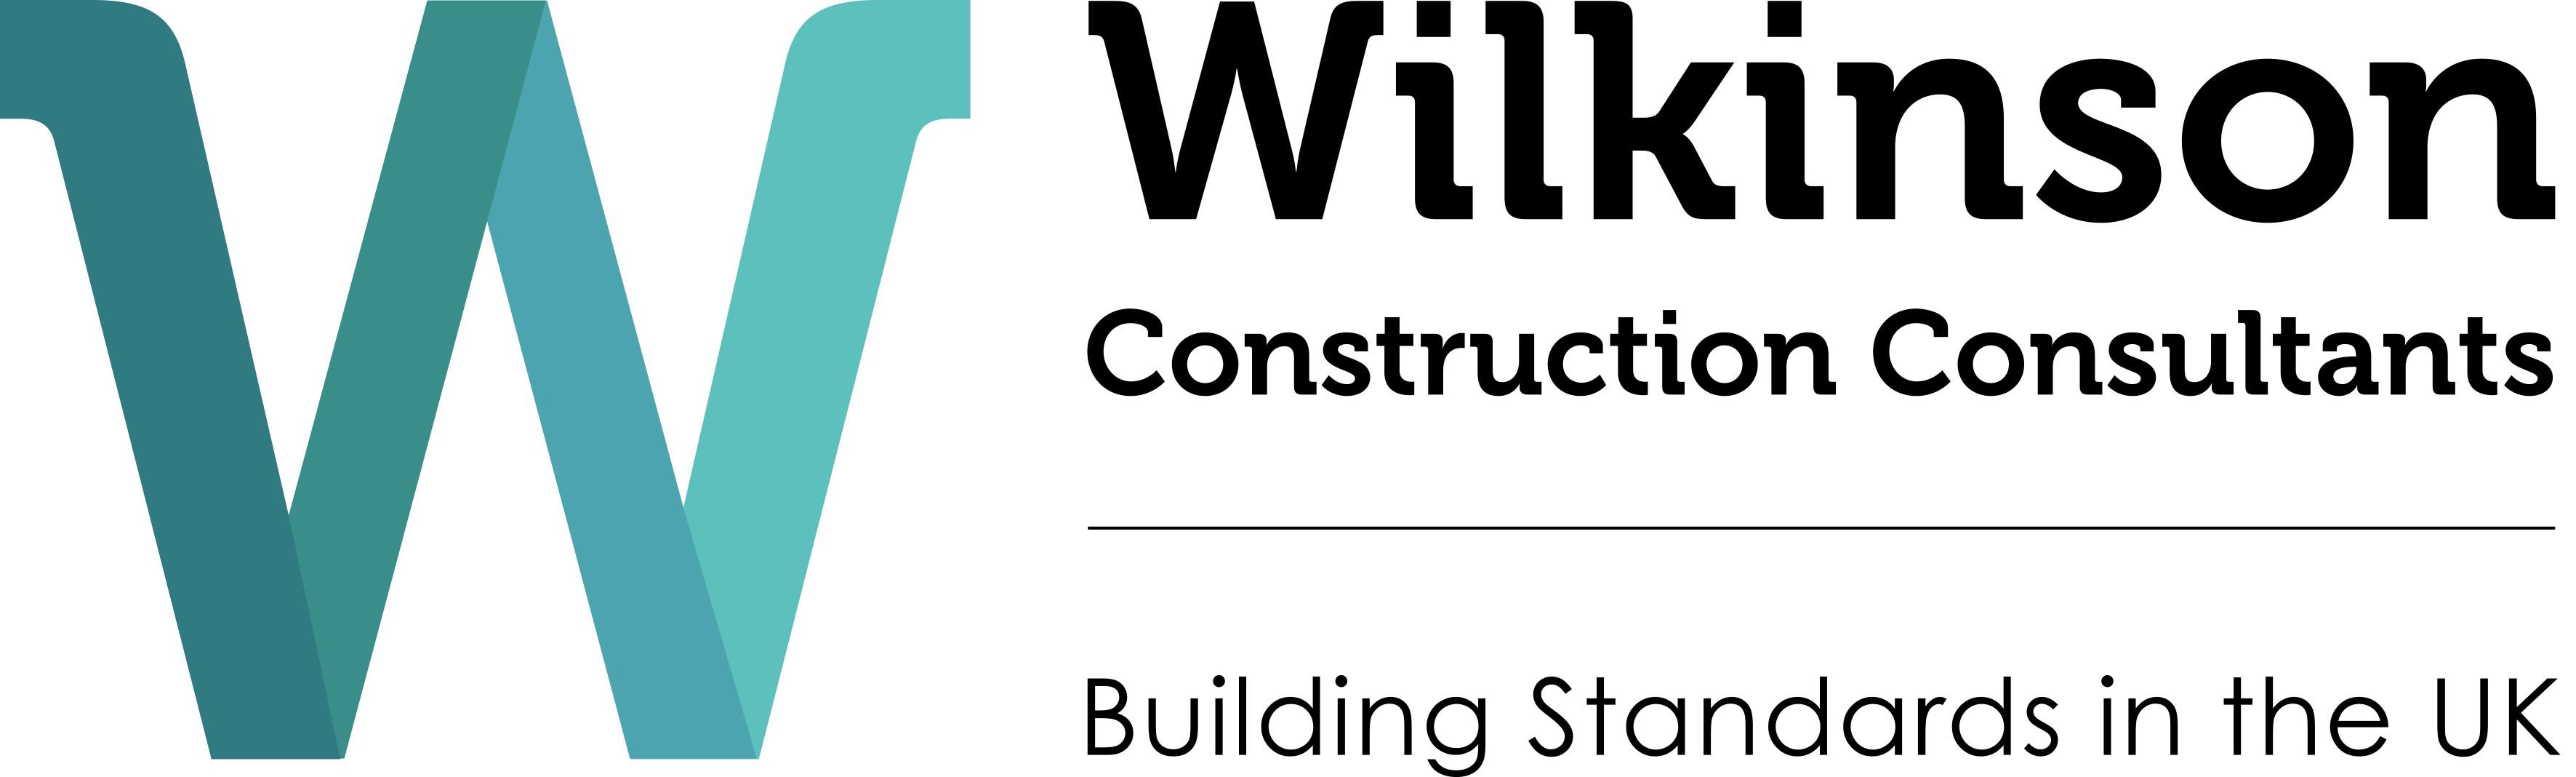 Wilkinson-Blue_Grad_POS_300dpiCMYK.jpg